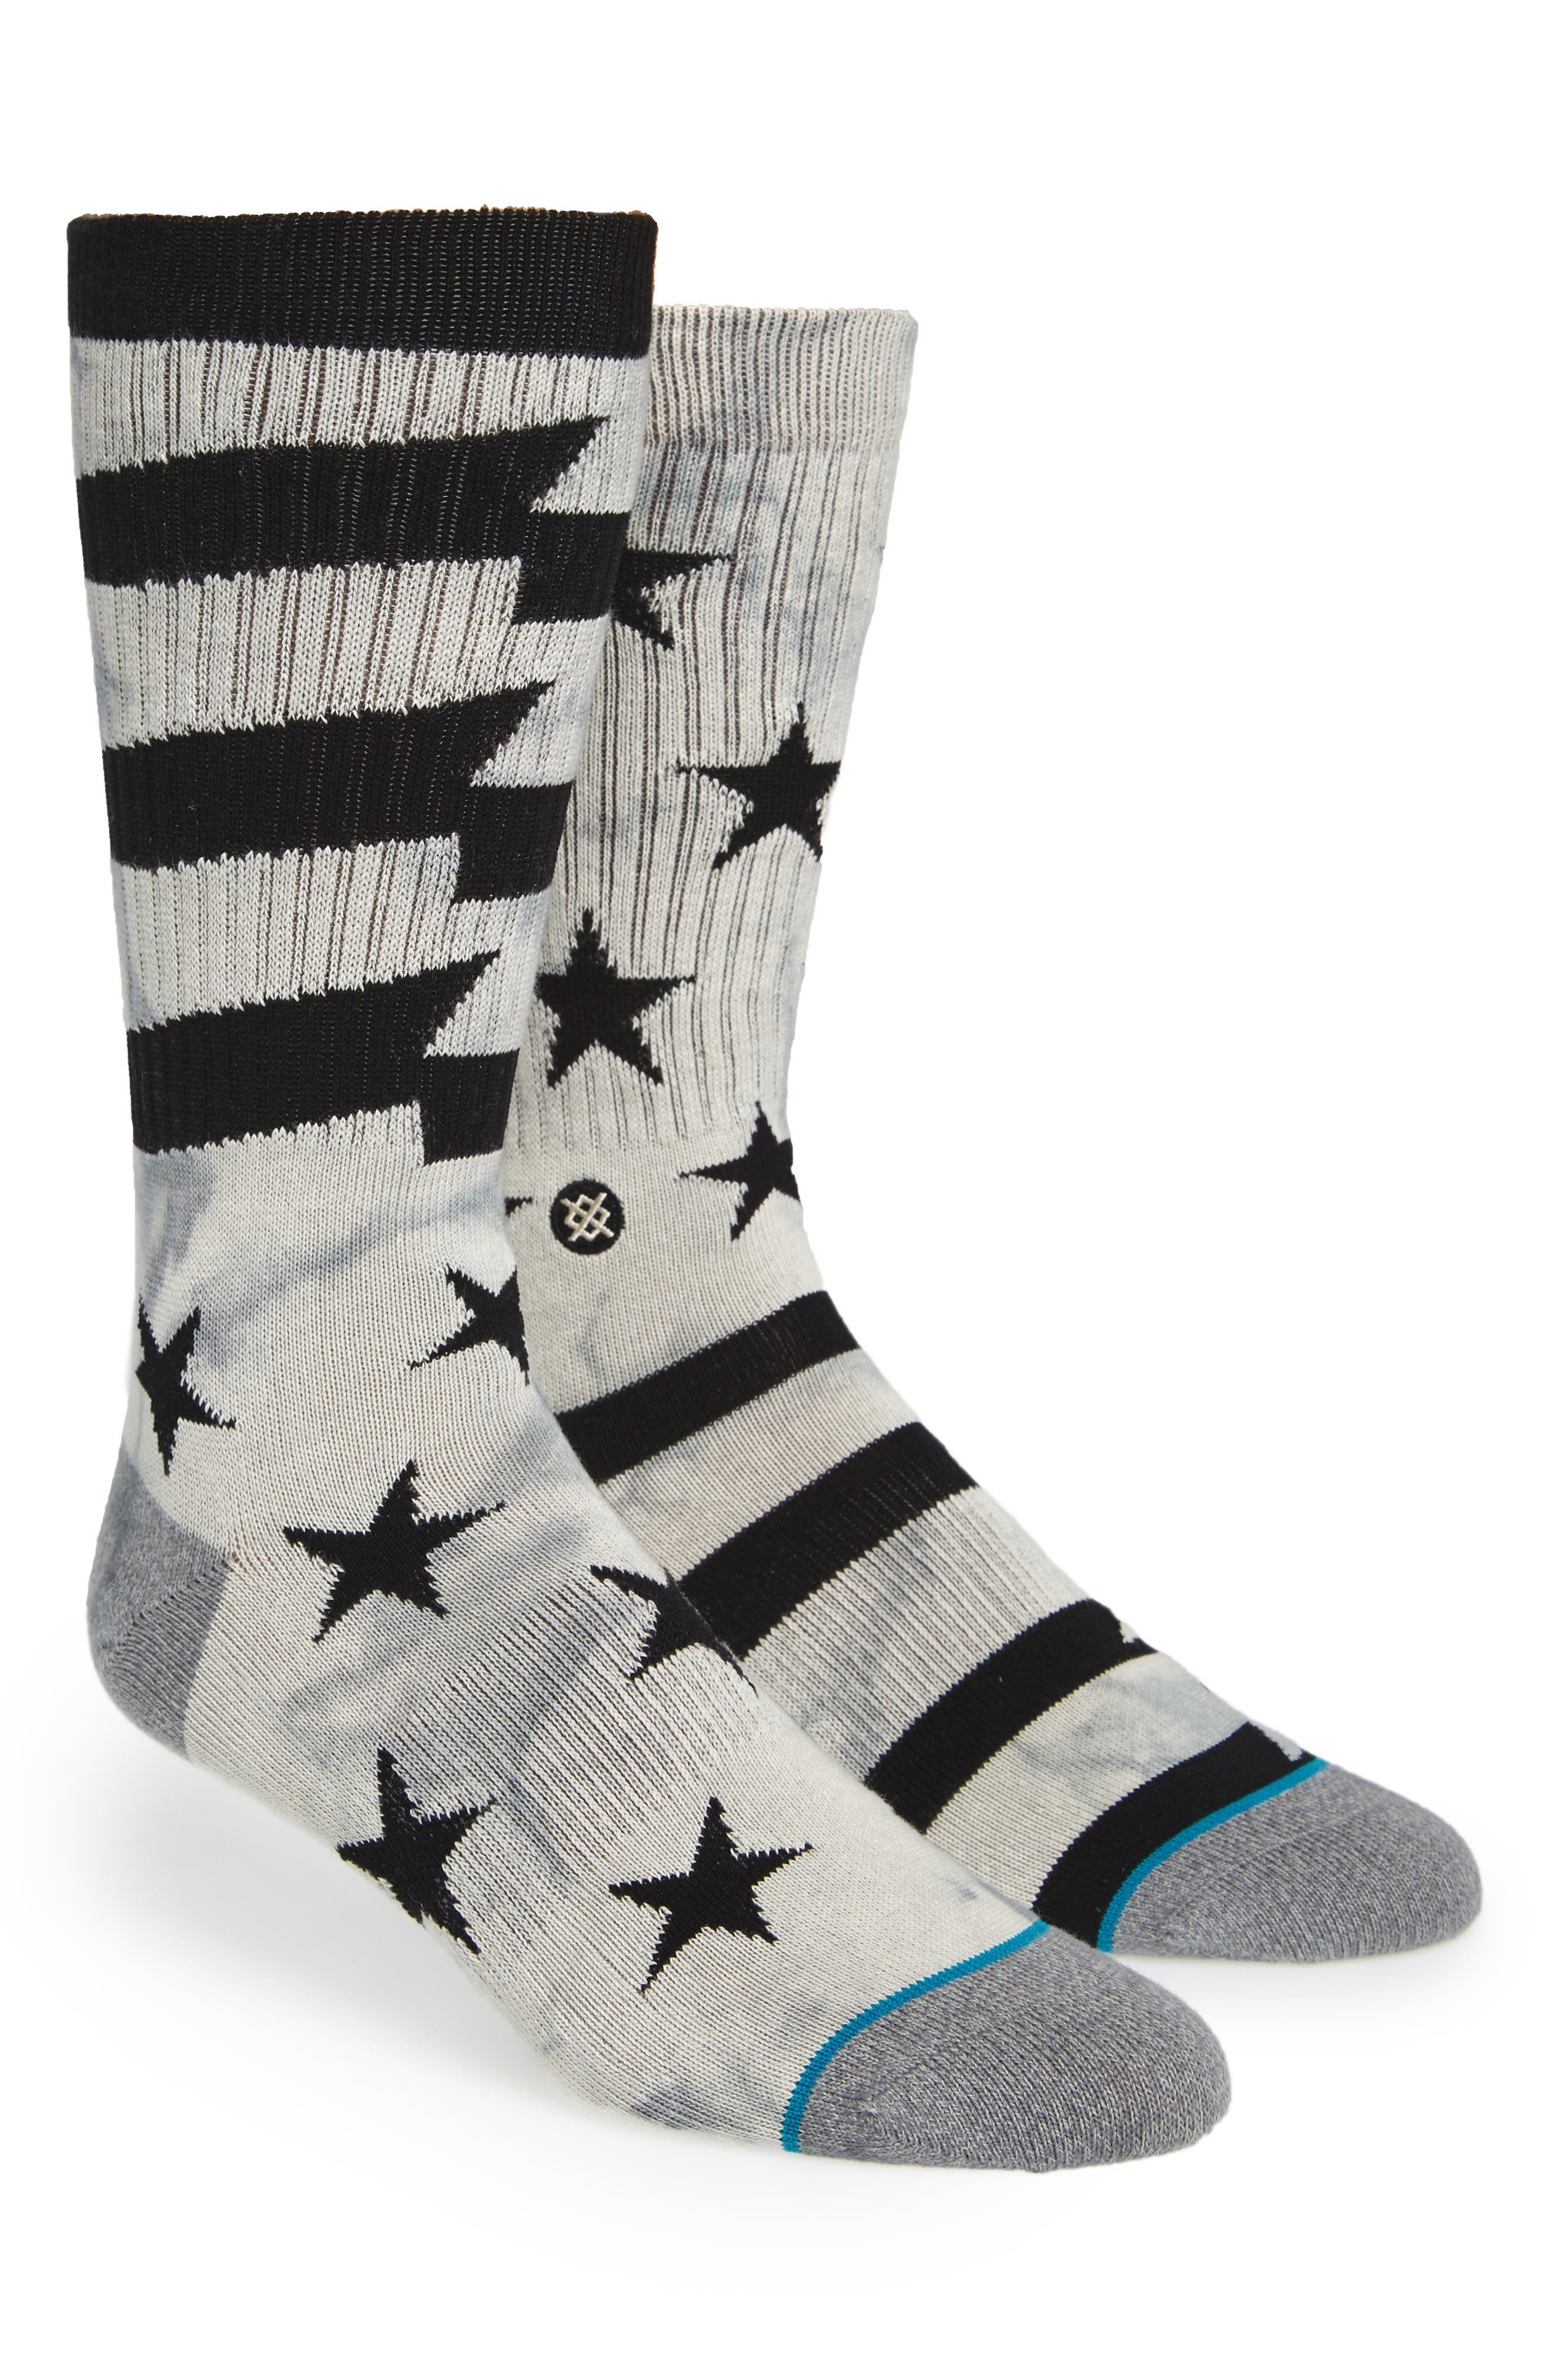 Sidereal Crew Socks,                             Main thumbnail 1, color,                             Grey